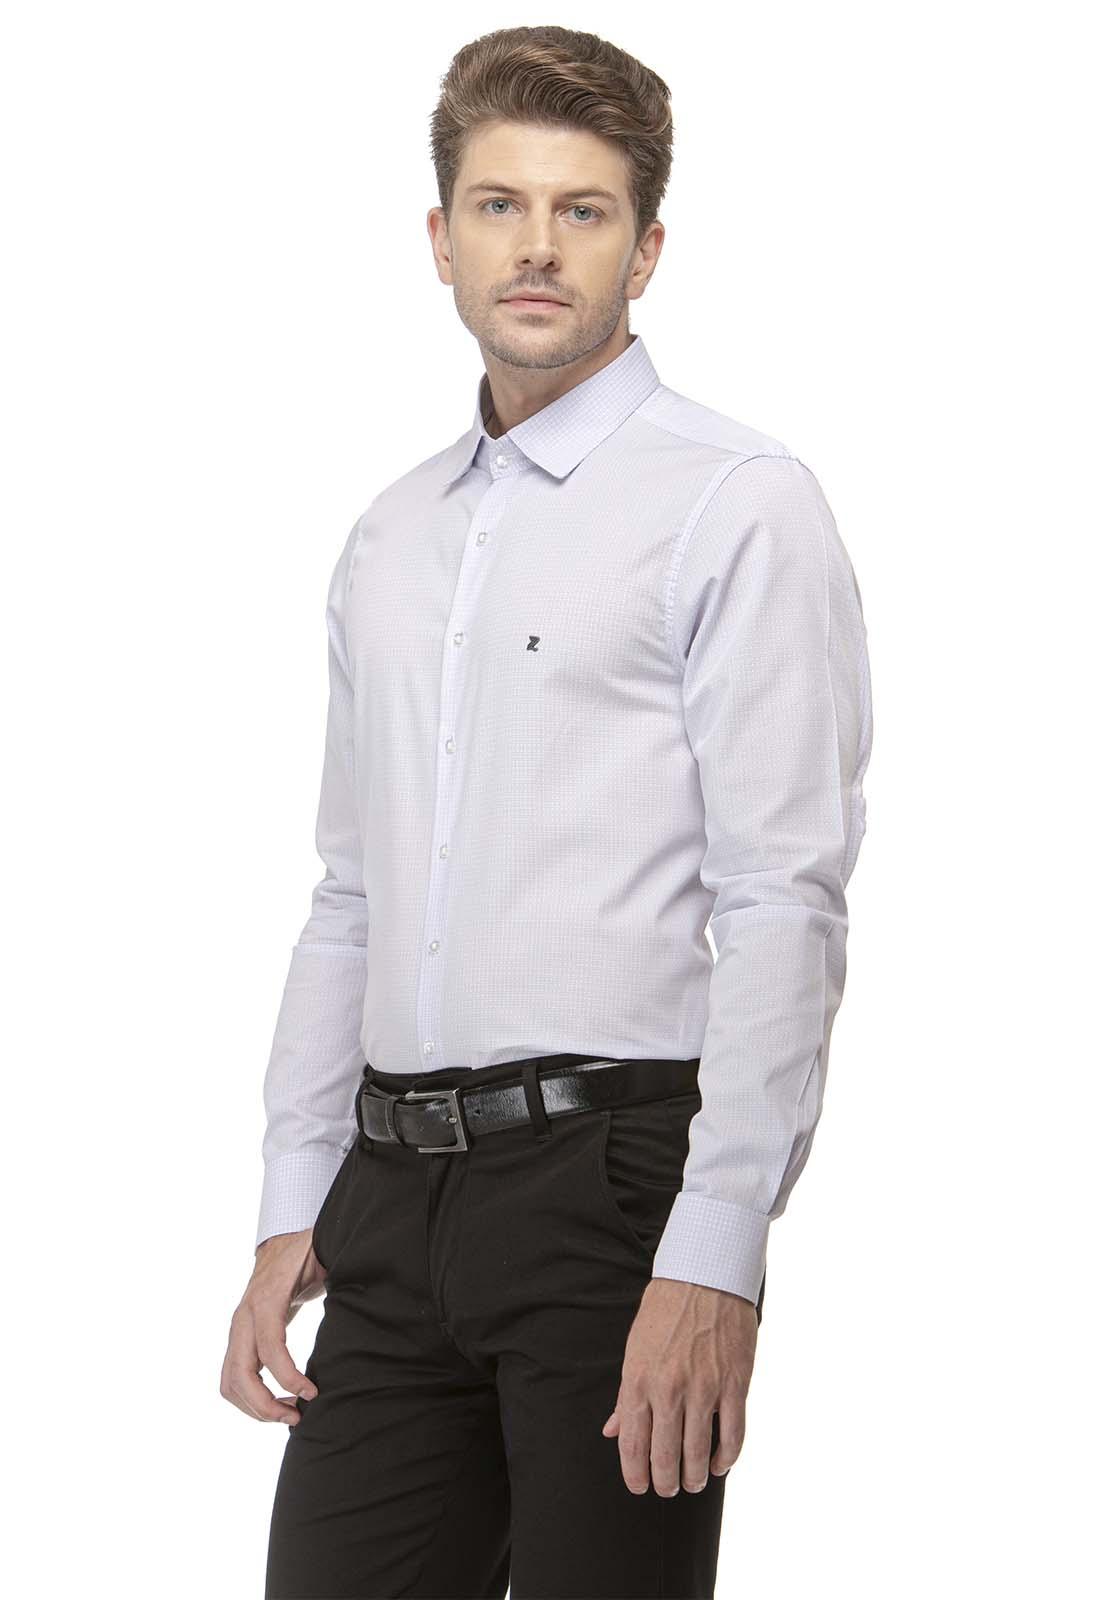 Camisa Social Slim Zaiko Quadriculada Manga Longa 2576